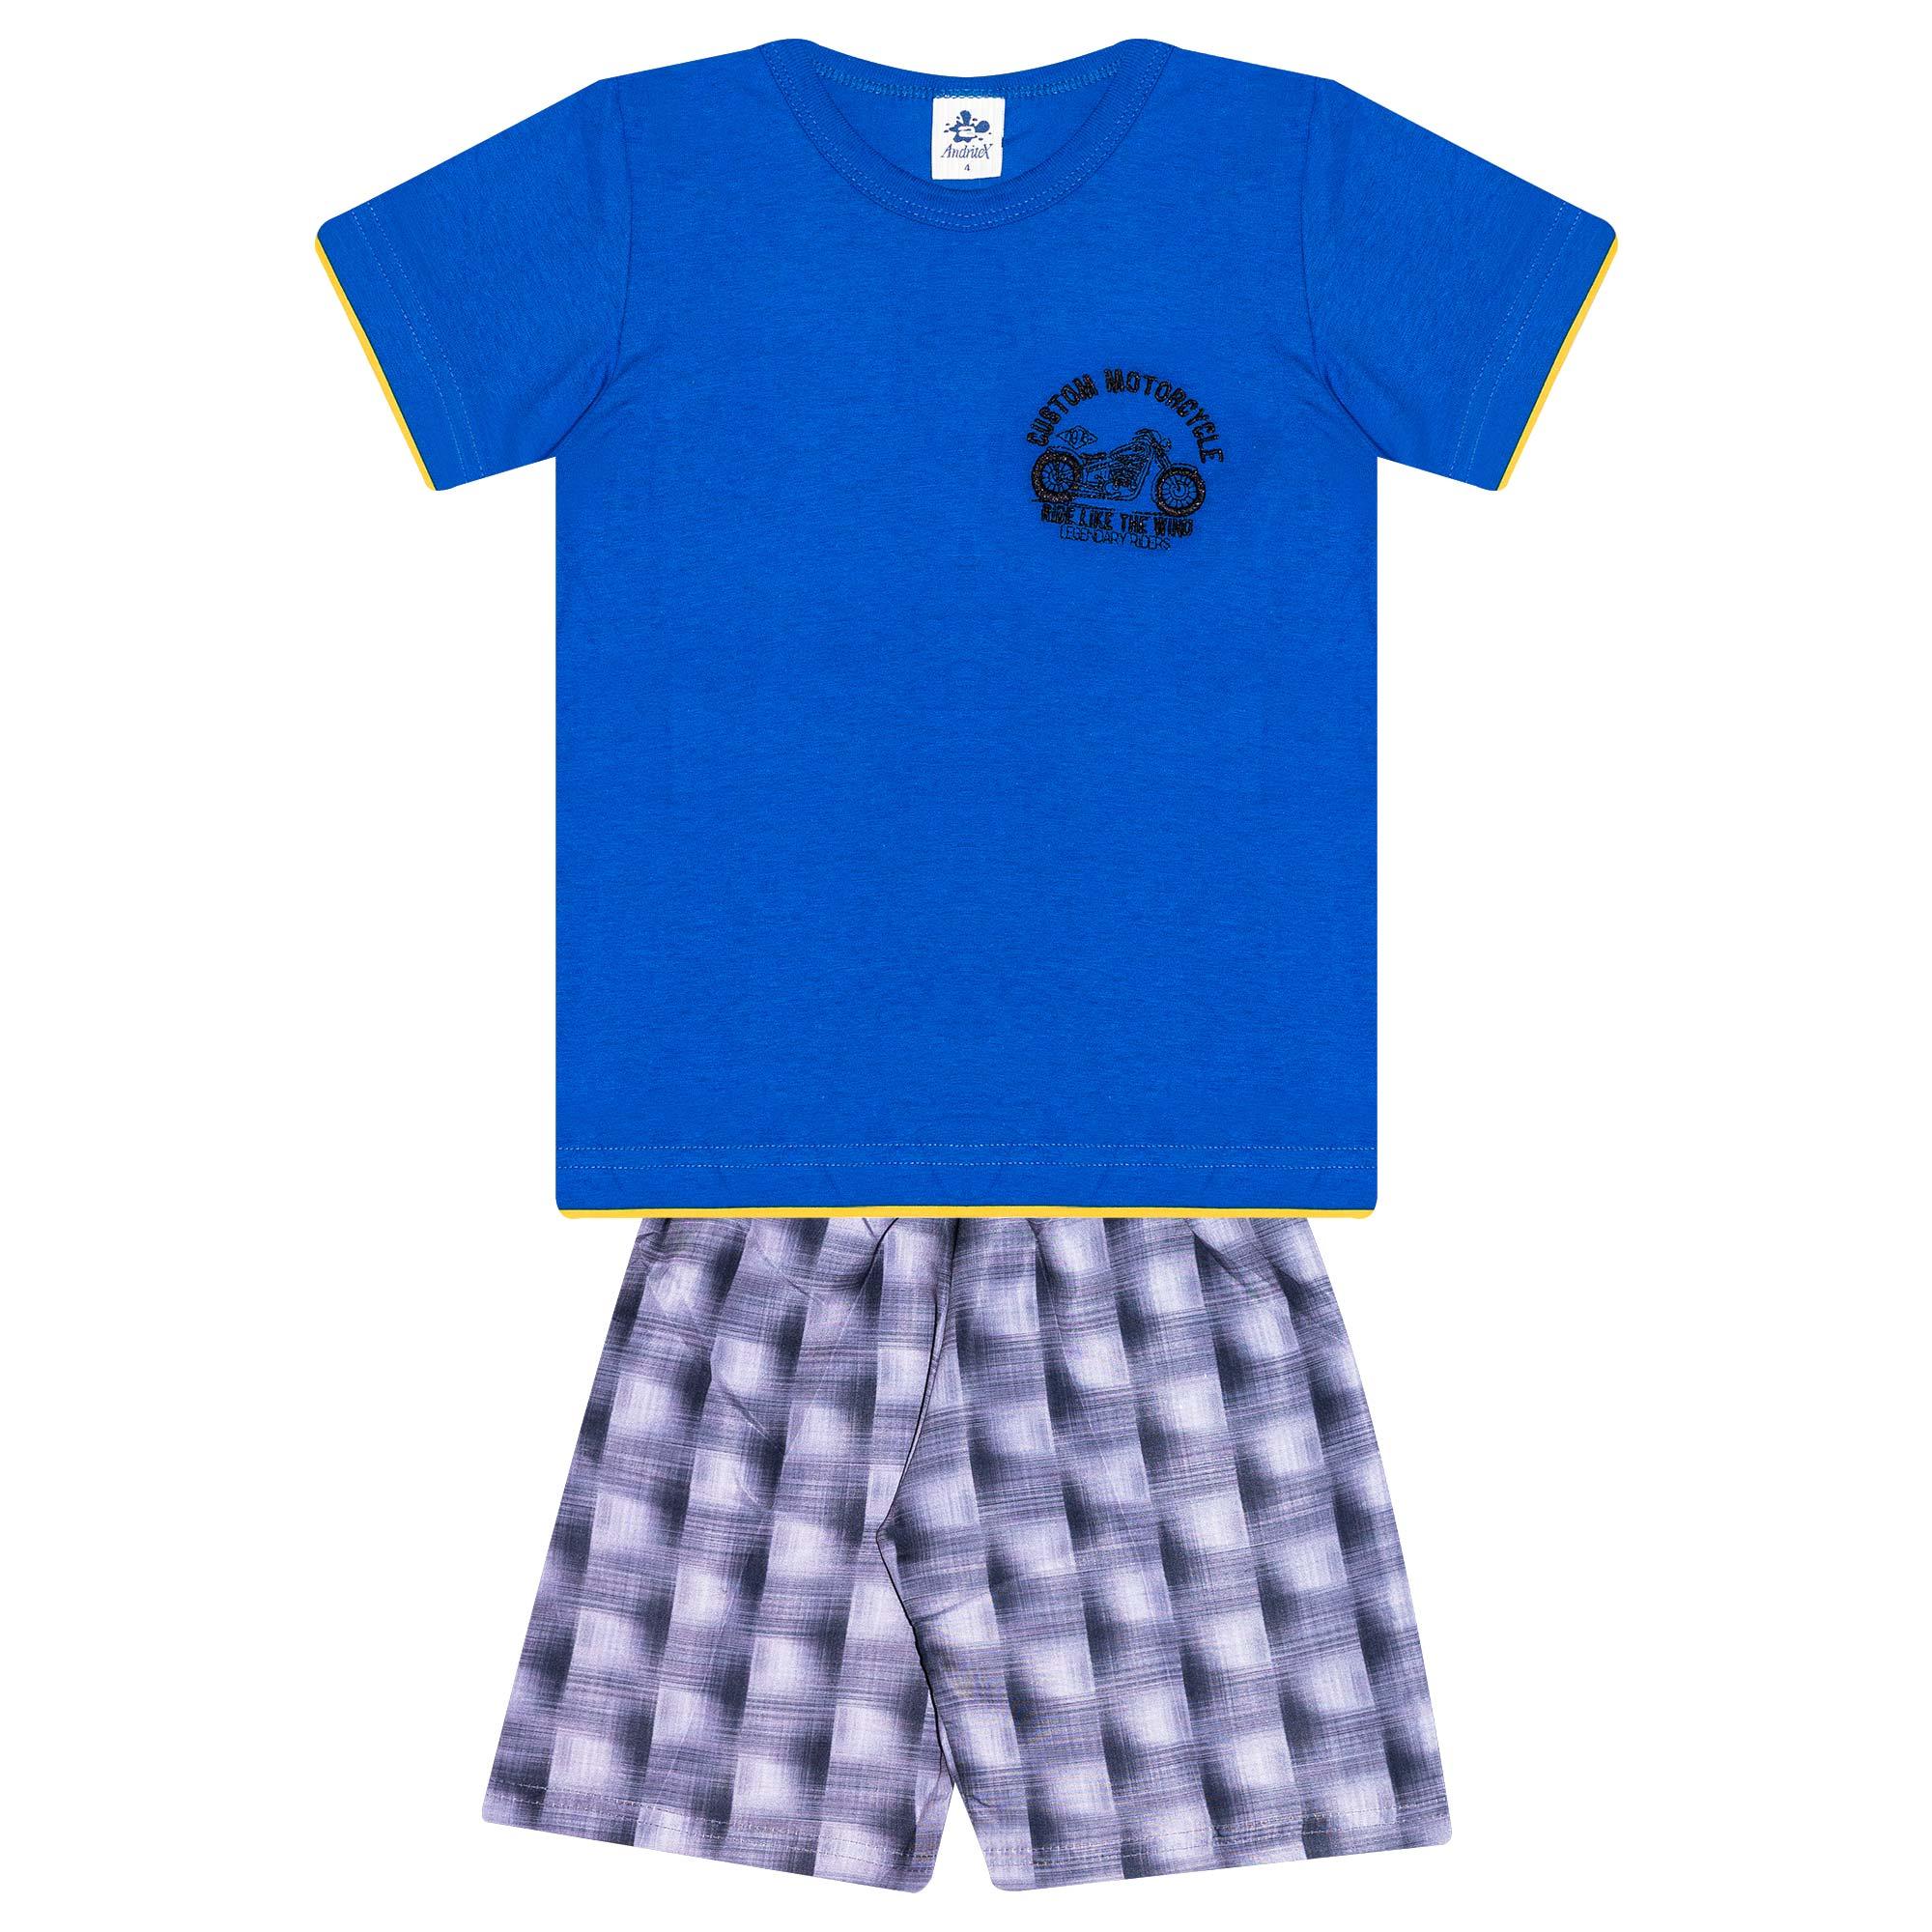 Conjunto Infantil Masculino - Ref 4778  - Azul - Andritex